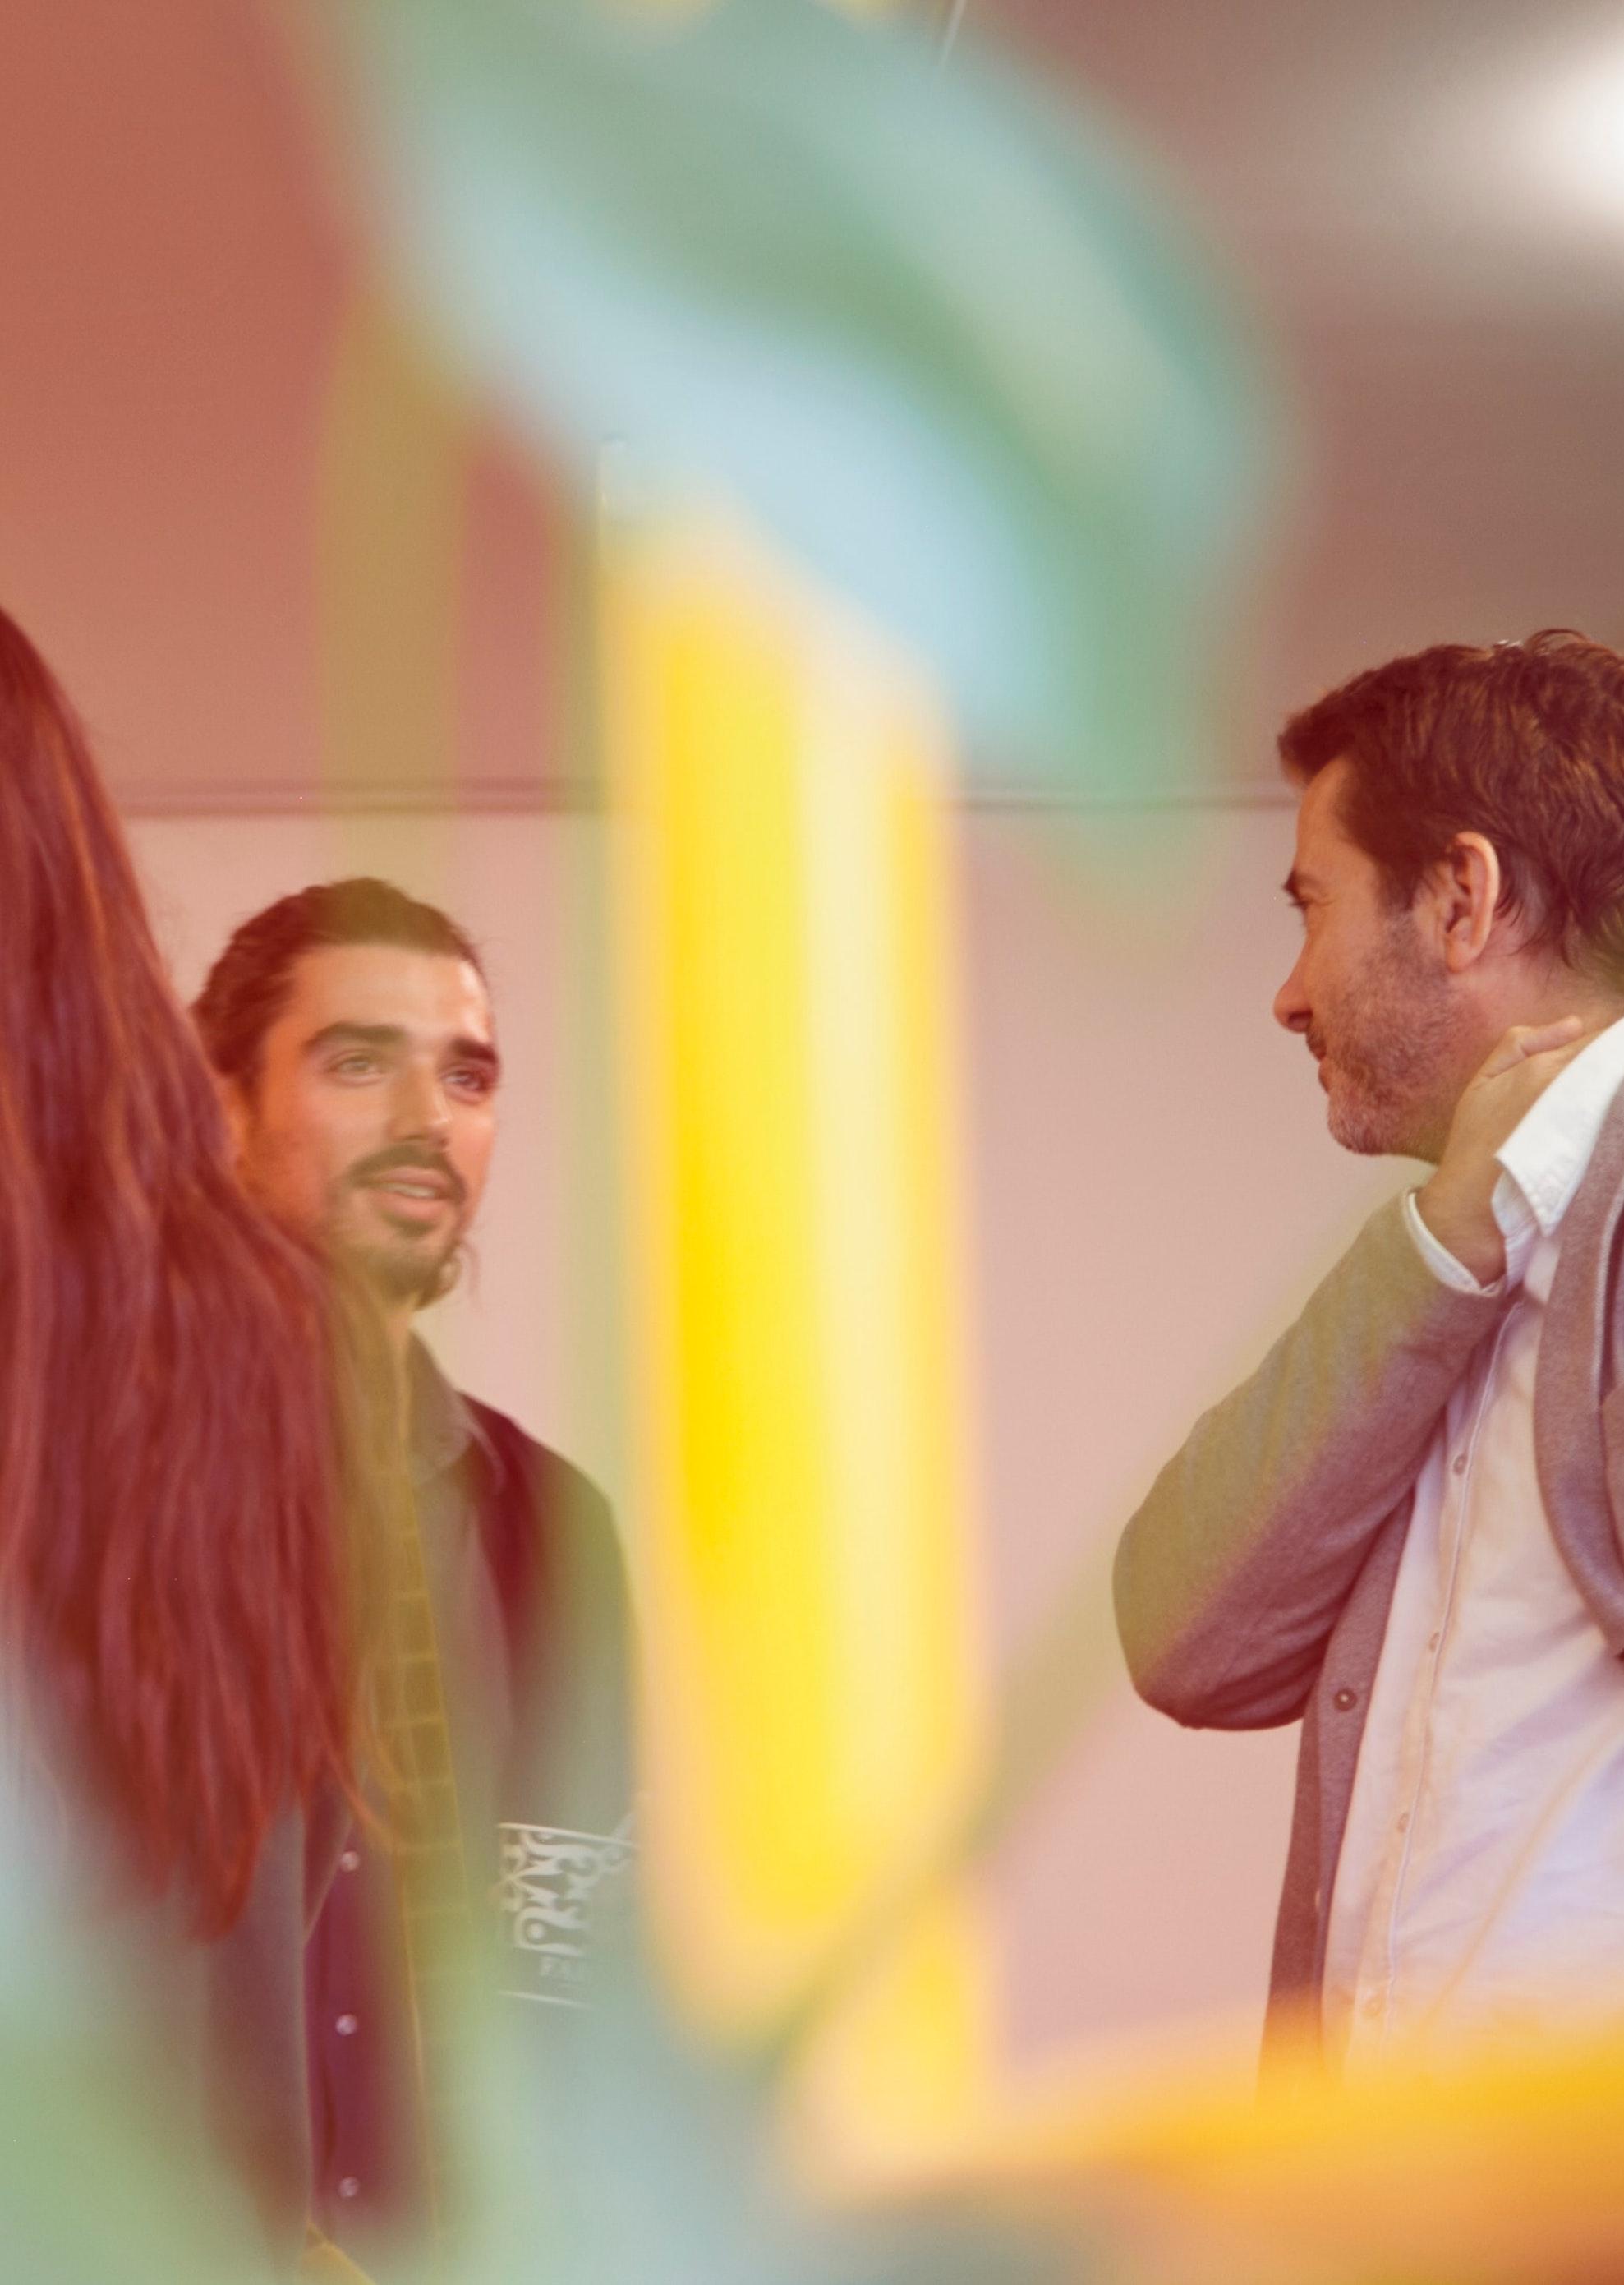 2 hommes en train de discuter